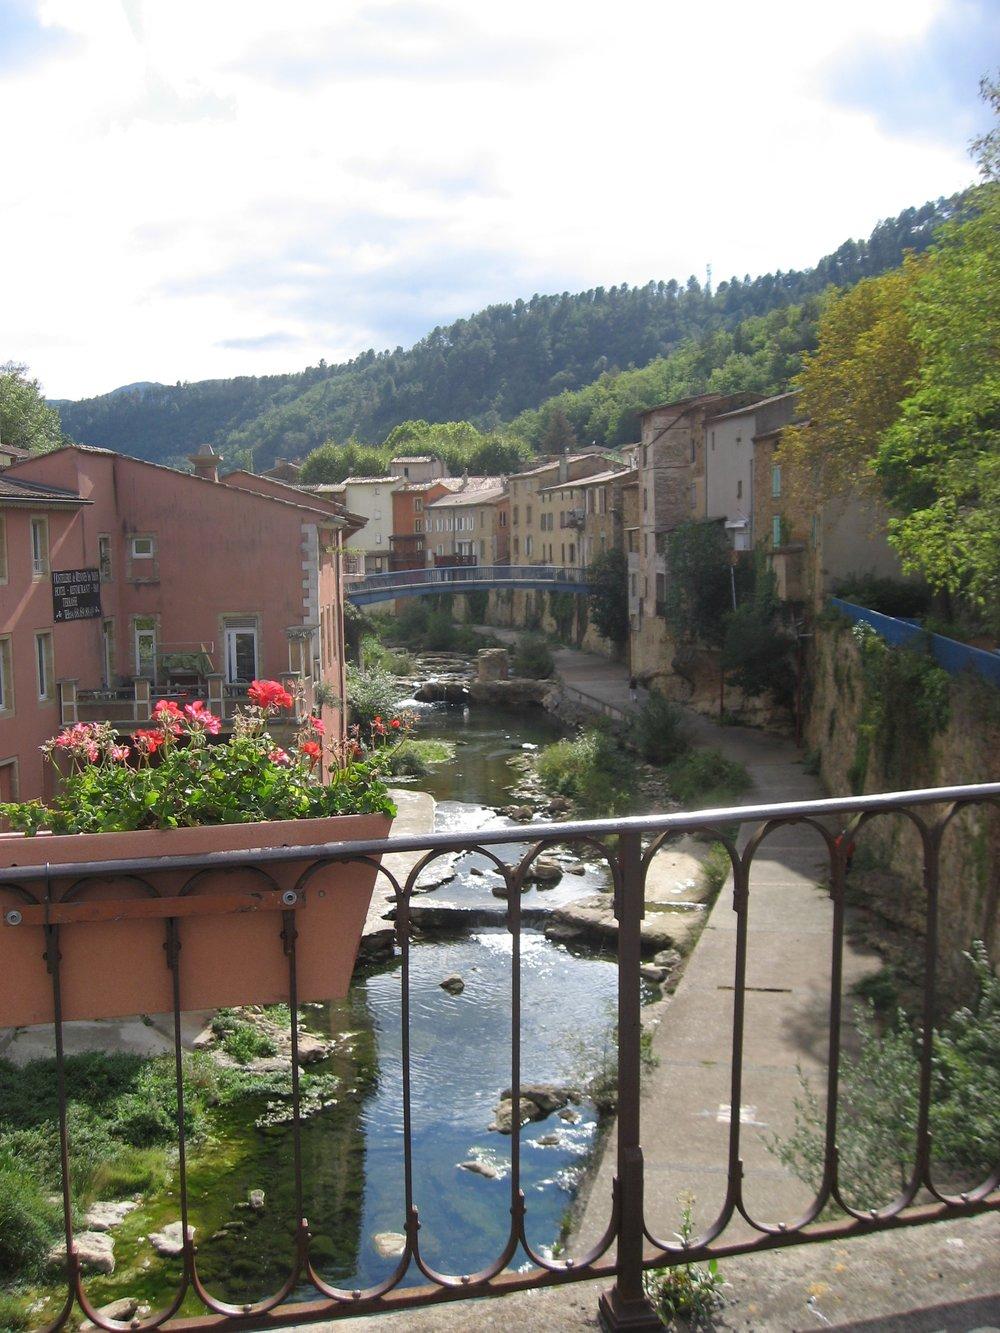 Rennes-les-Bains, France - Salz River & Village 2.jpg